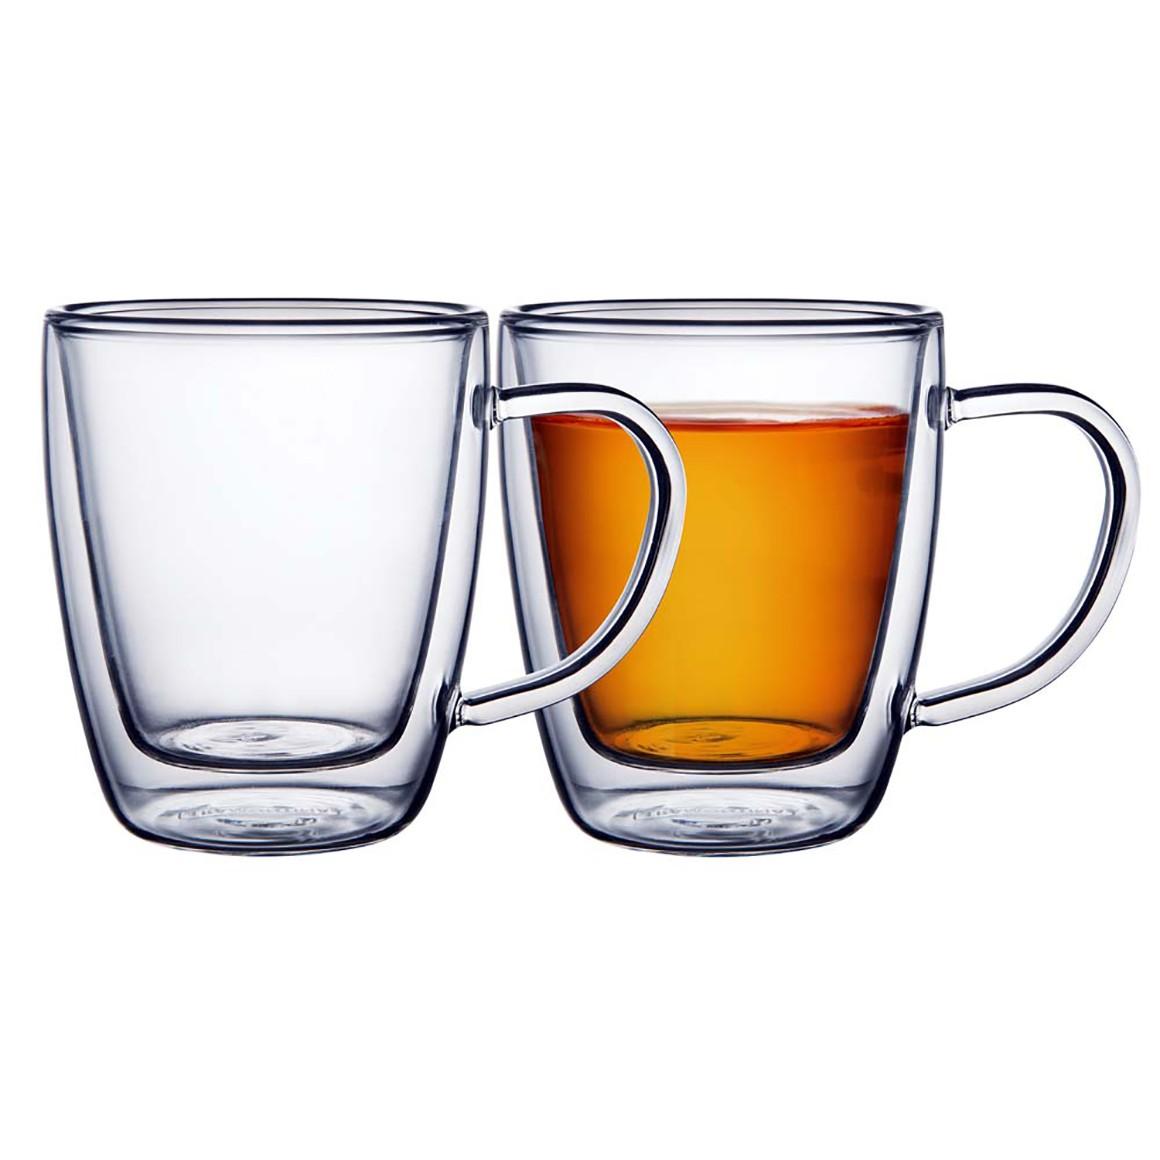 Conjunto de Xícaras para Chá ou Cappuccino em Vidro Duplo Tramontina - 2 un